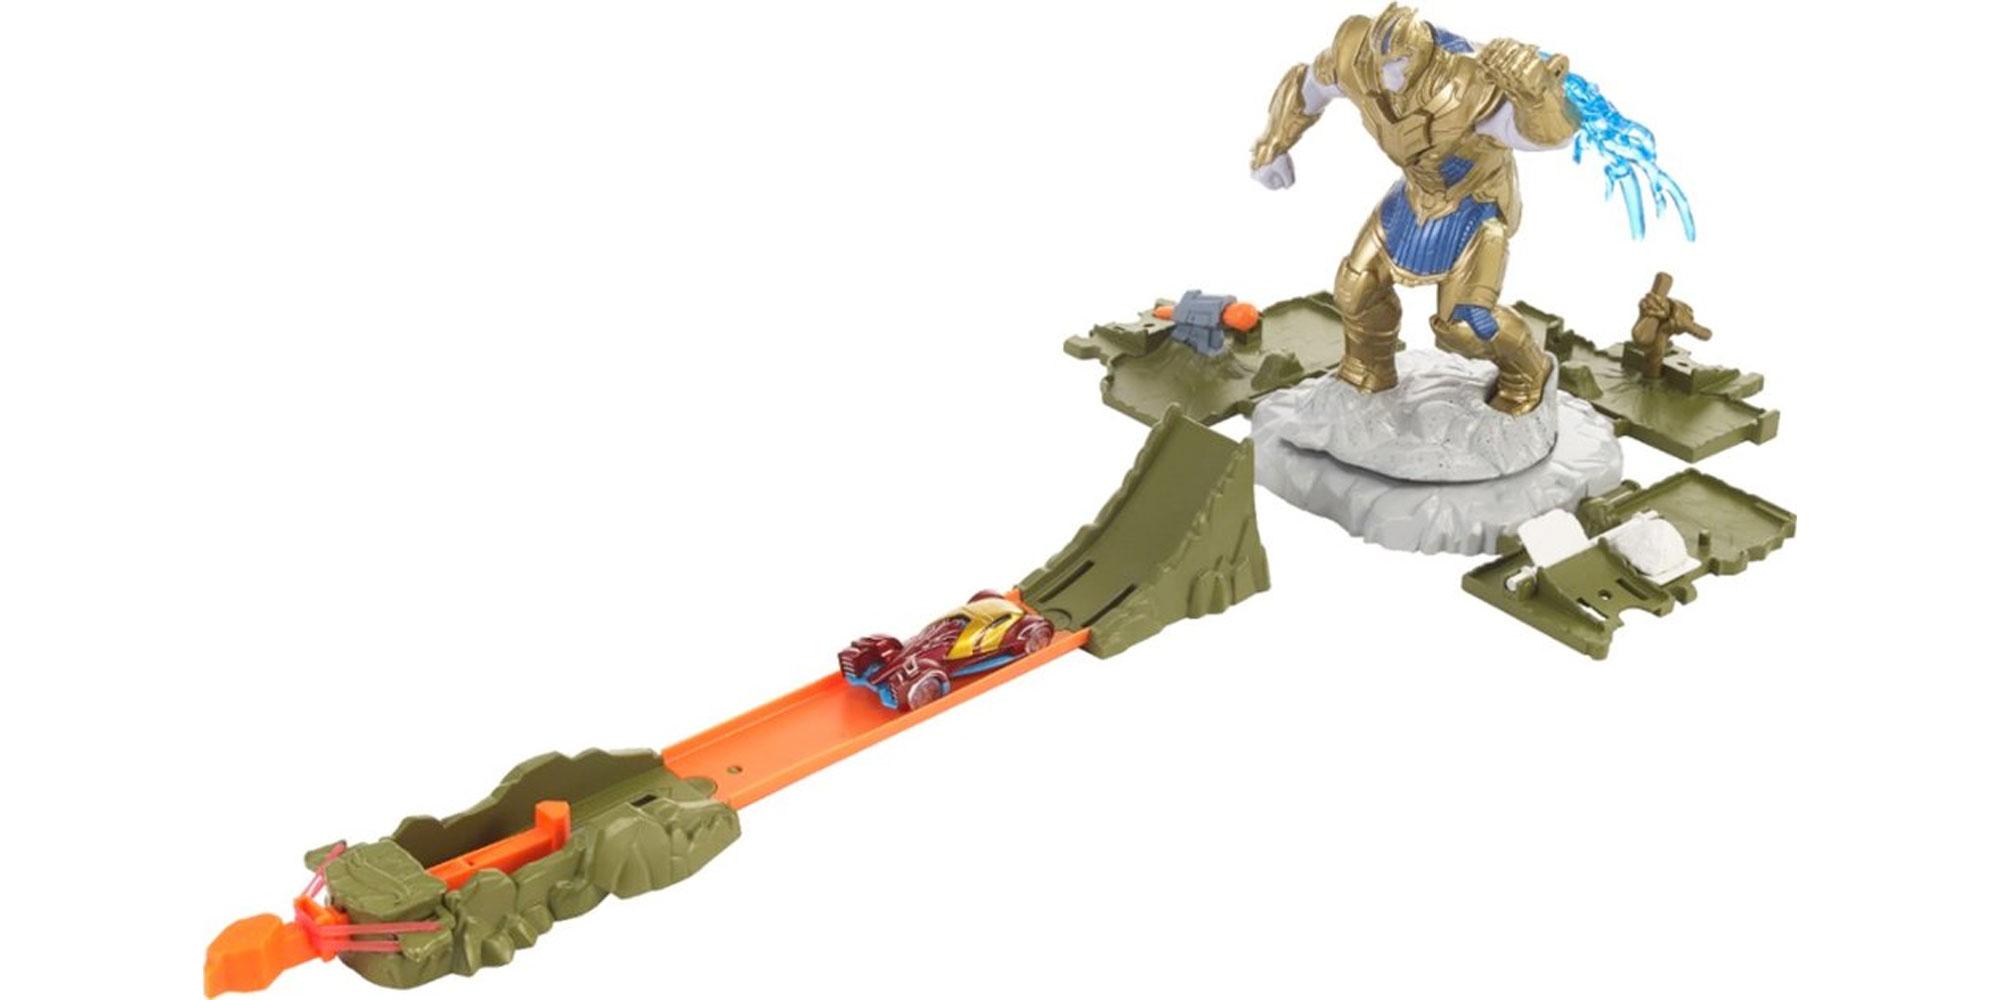 Prep for Endgame & help the Avengers take down Thanos w/ this $8.50 Hot Wheels set